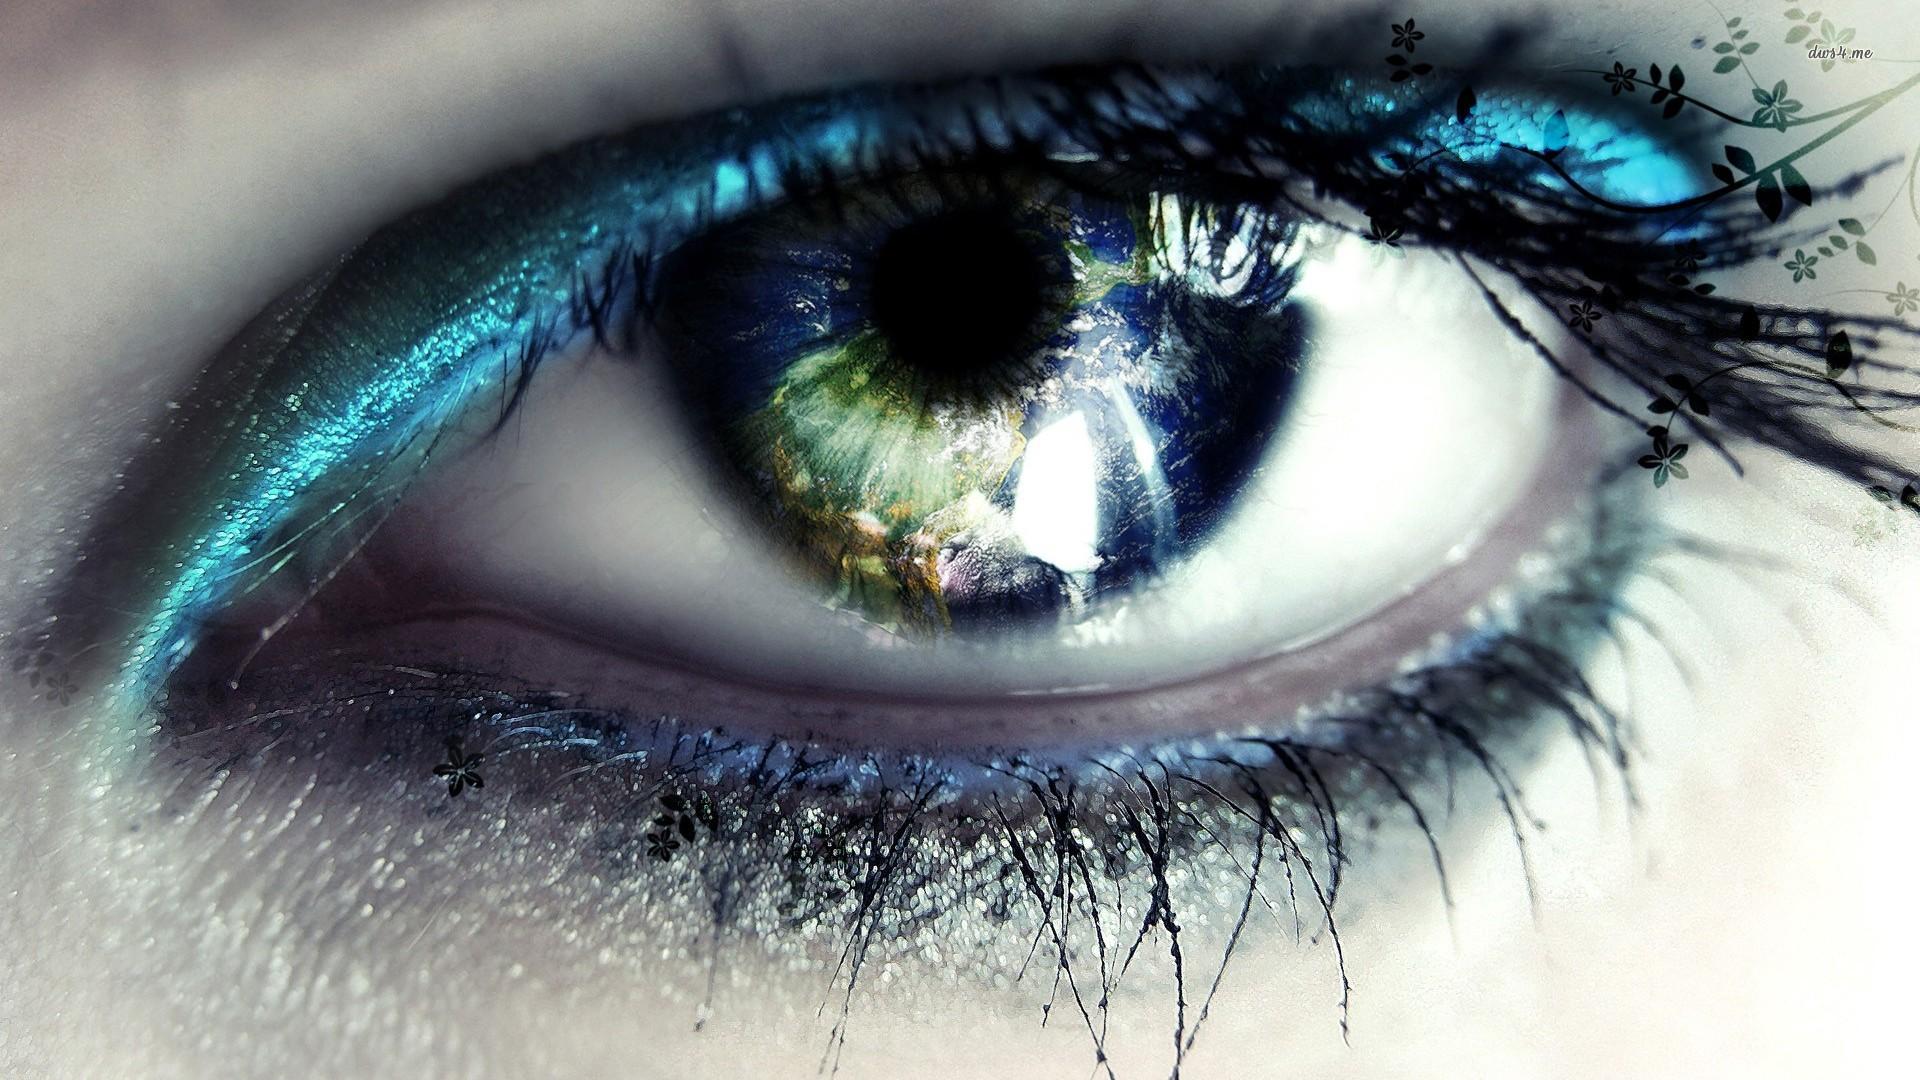 13025-world-in-her-eyes-1920x1080-digital-art-wallpaper